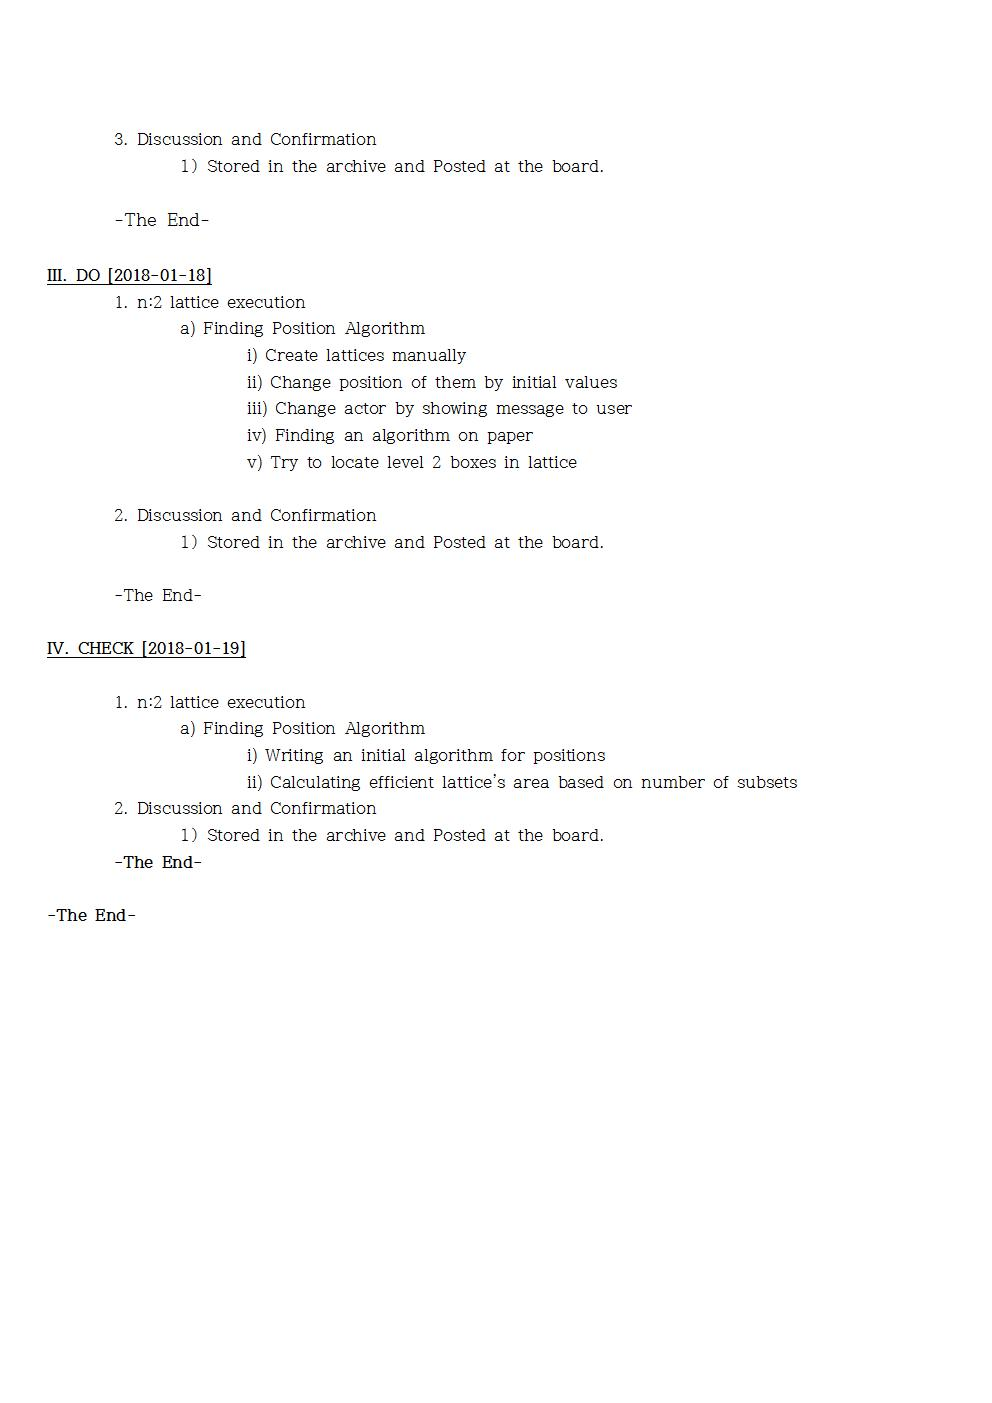 D-[18-002-RD-02]-[PRISM2.0-ADOxx]-[2018-01-19]-[MR]002.jpg